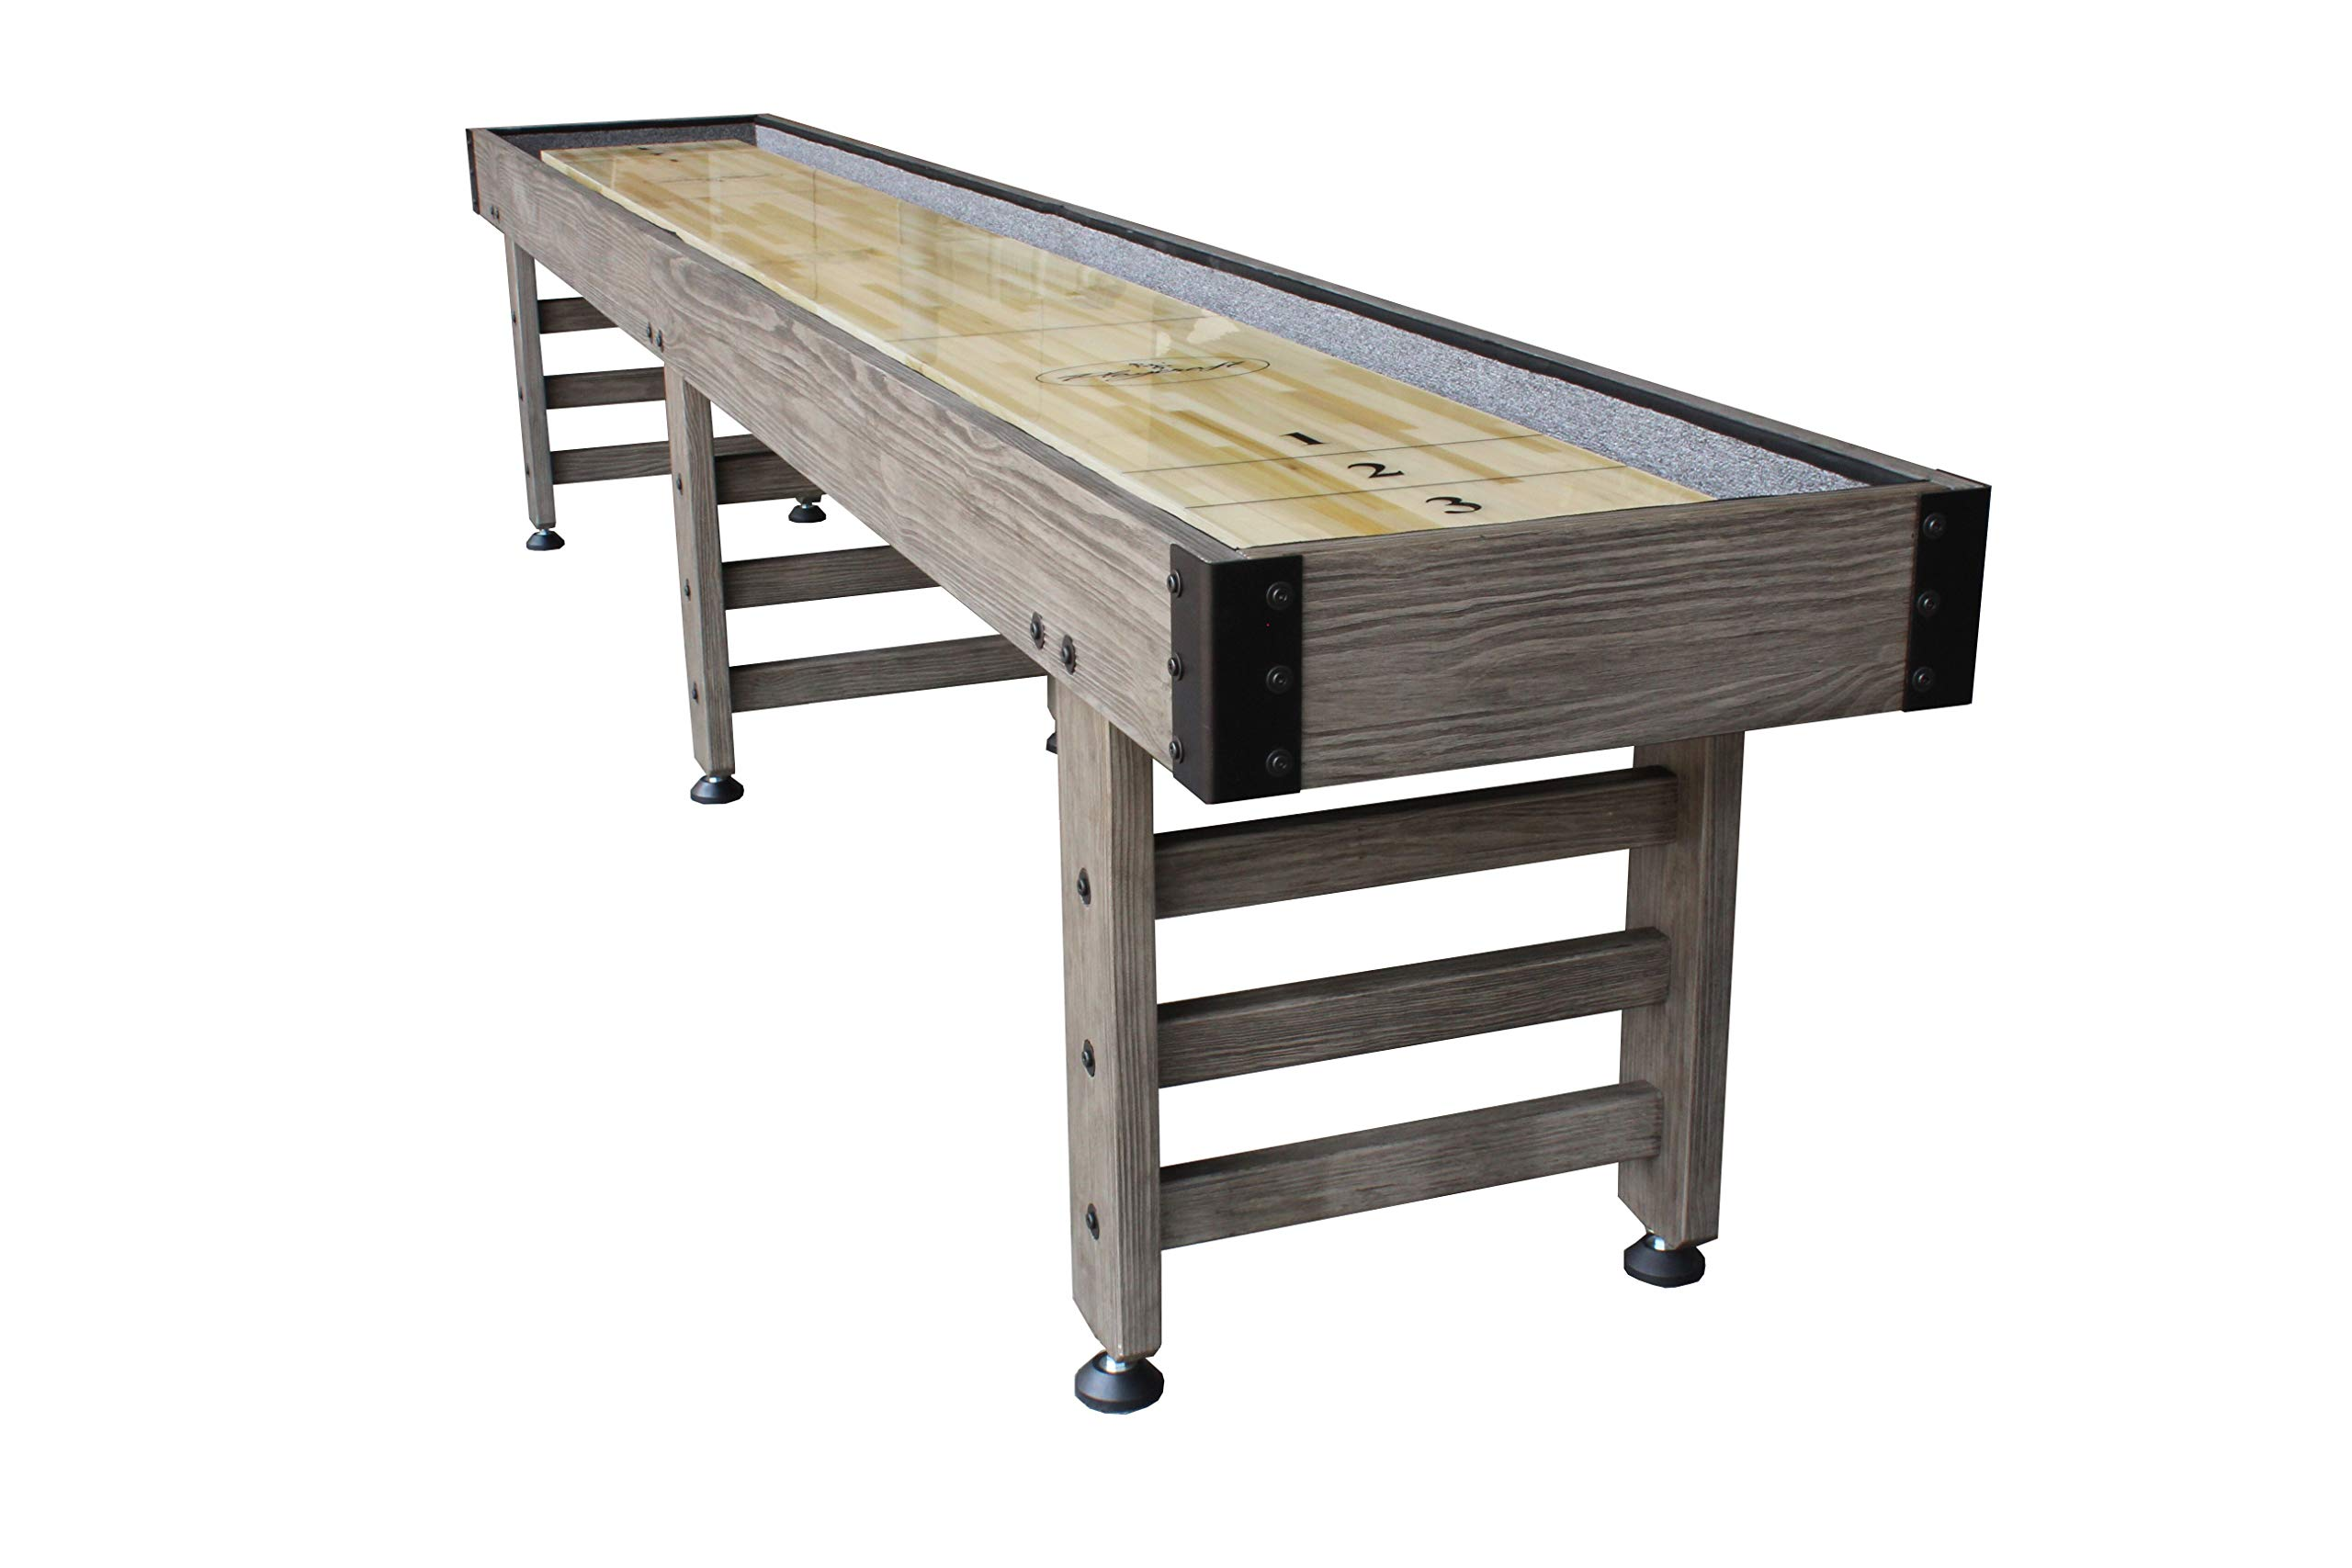 Playcraft Saybrook Smoke 12' Shuffleboard Table by Playcraft